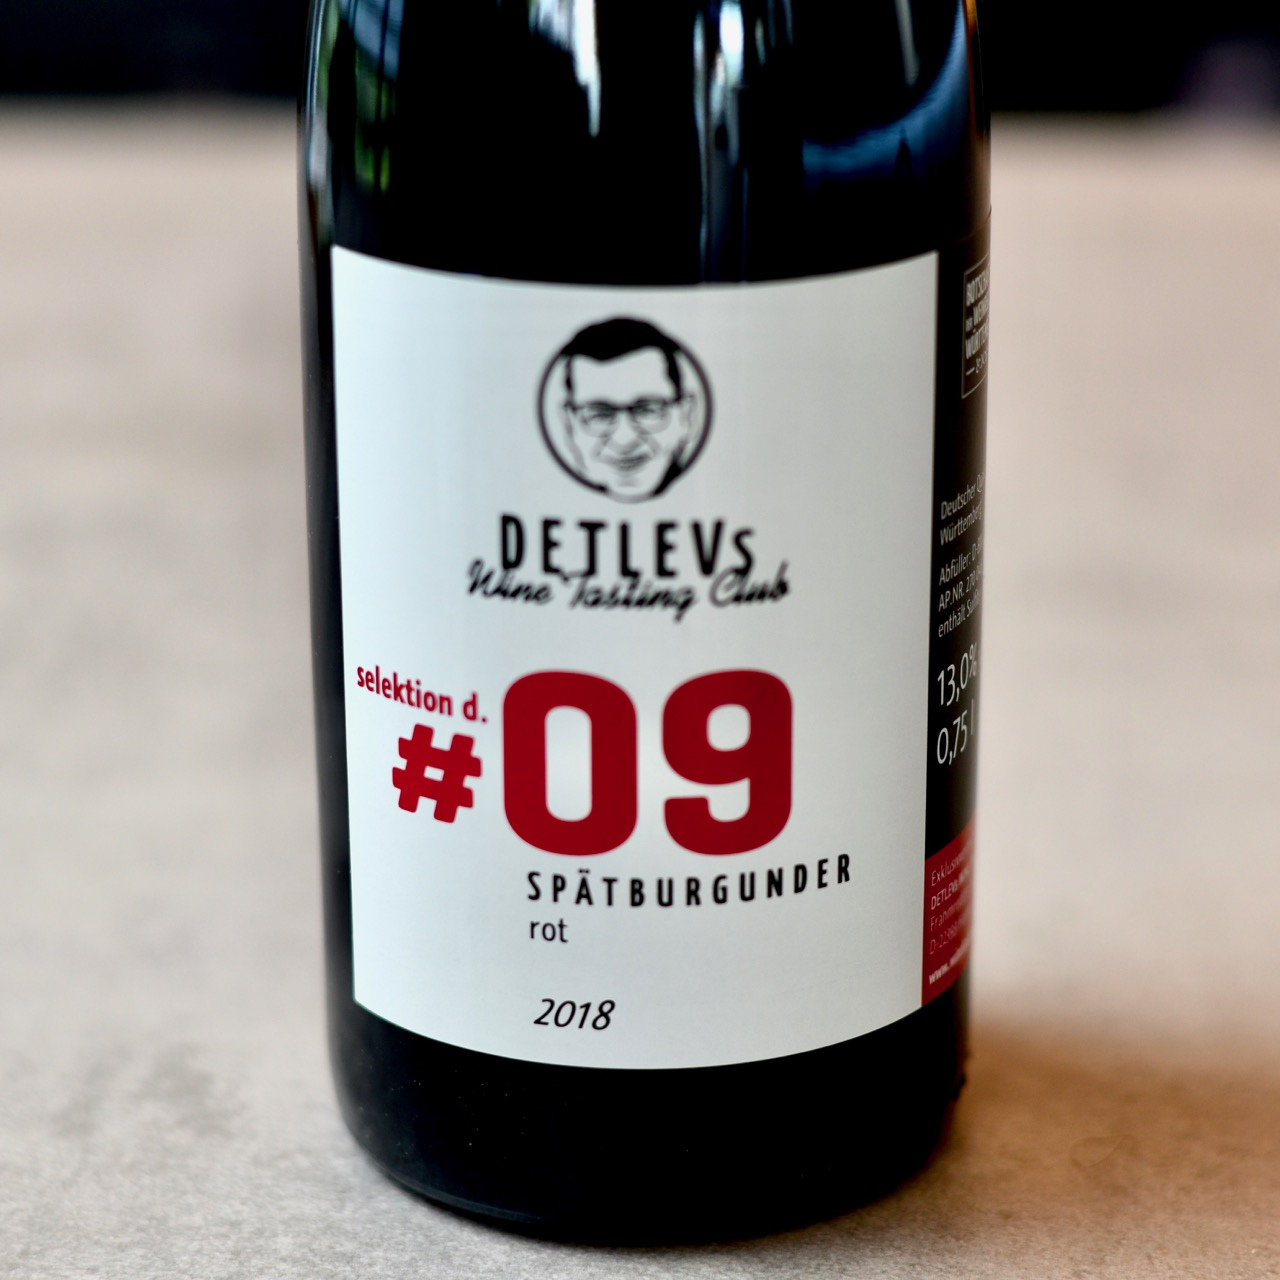 "DETLEVs ""selektion d."" No. 09 Spätburgunder, rot, 2018"